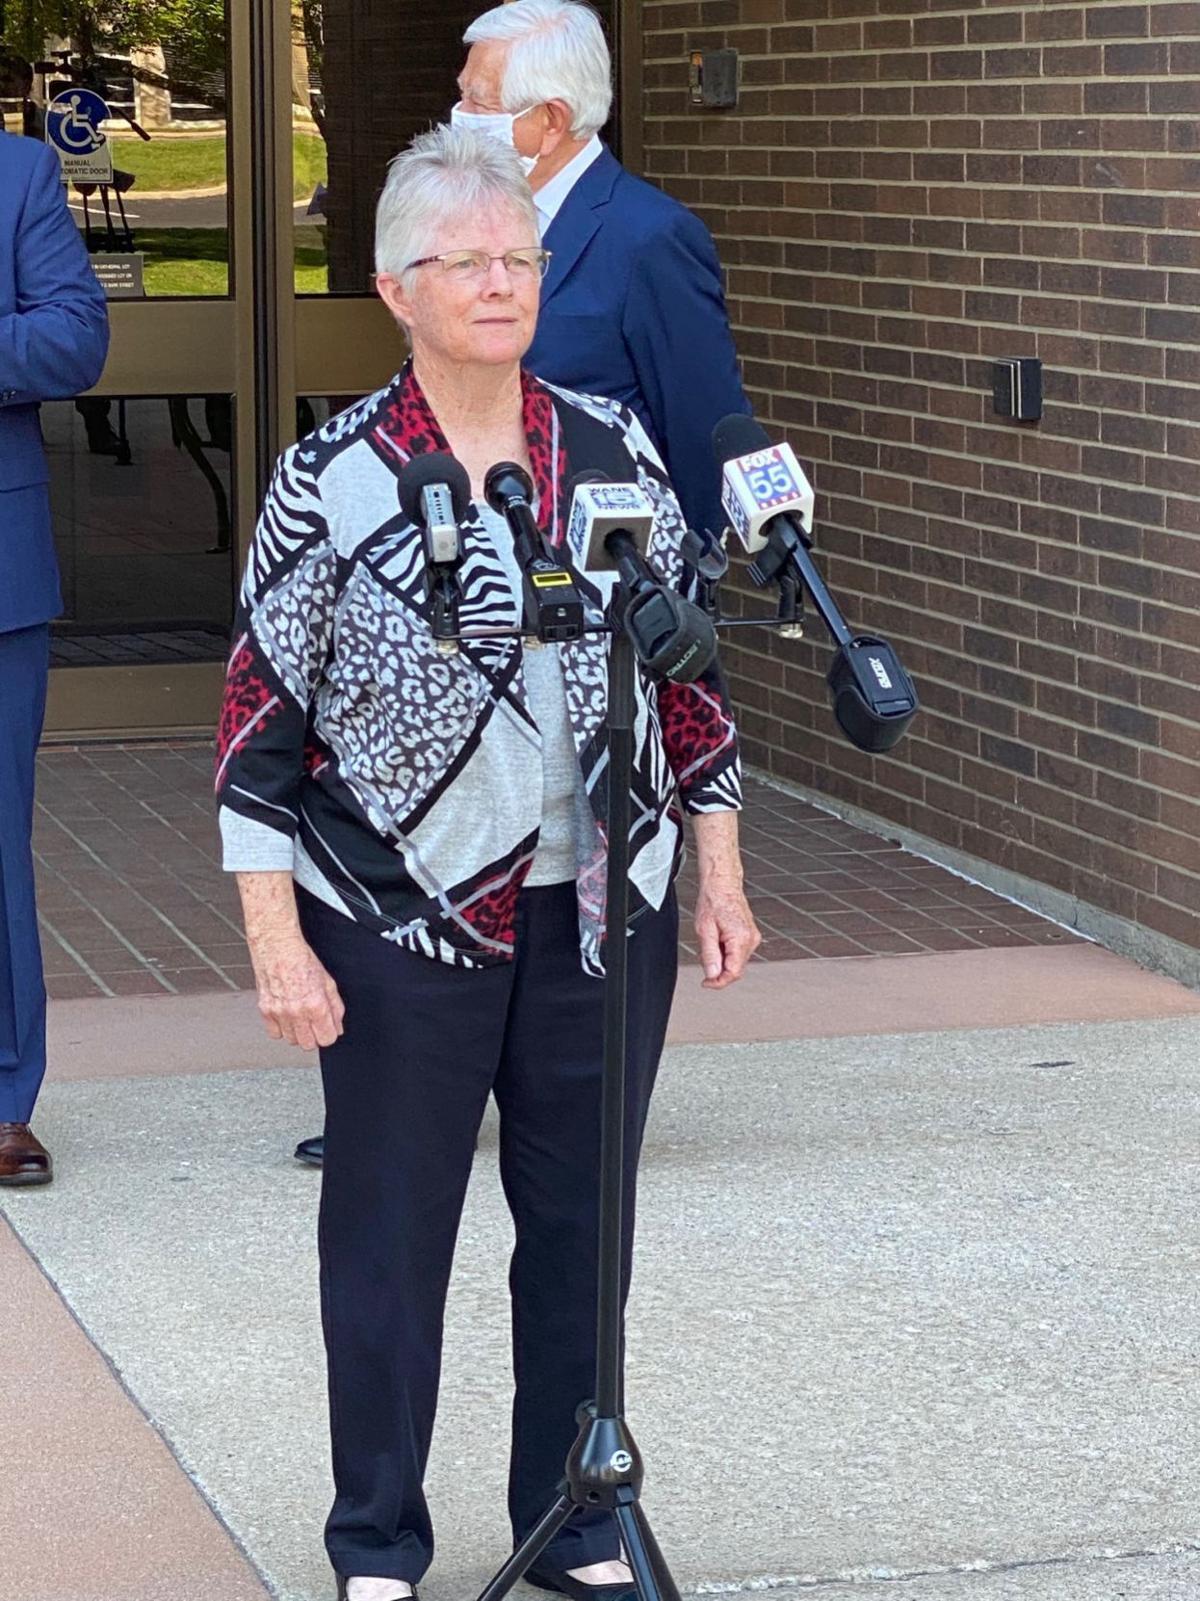 FWCS Board President Julie Hollingsworth